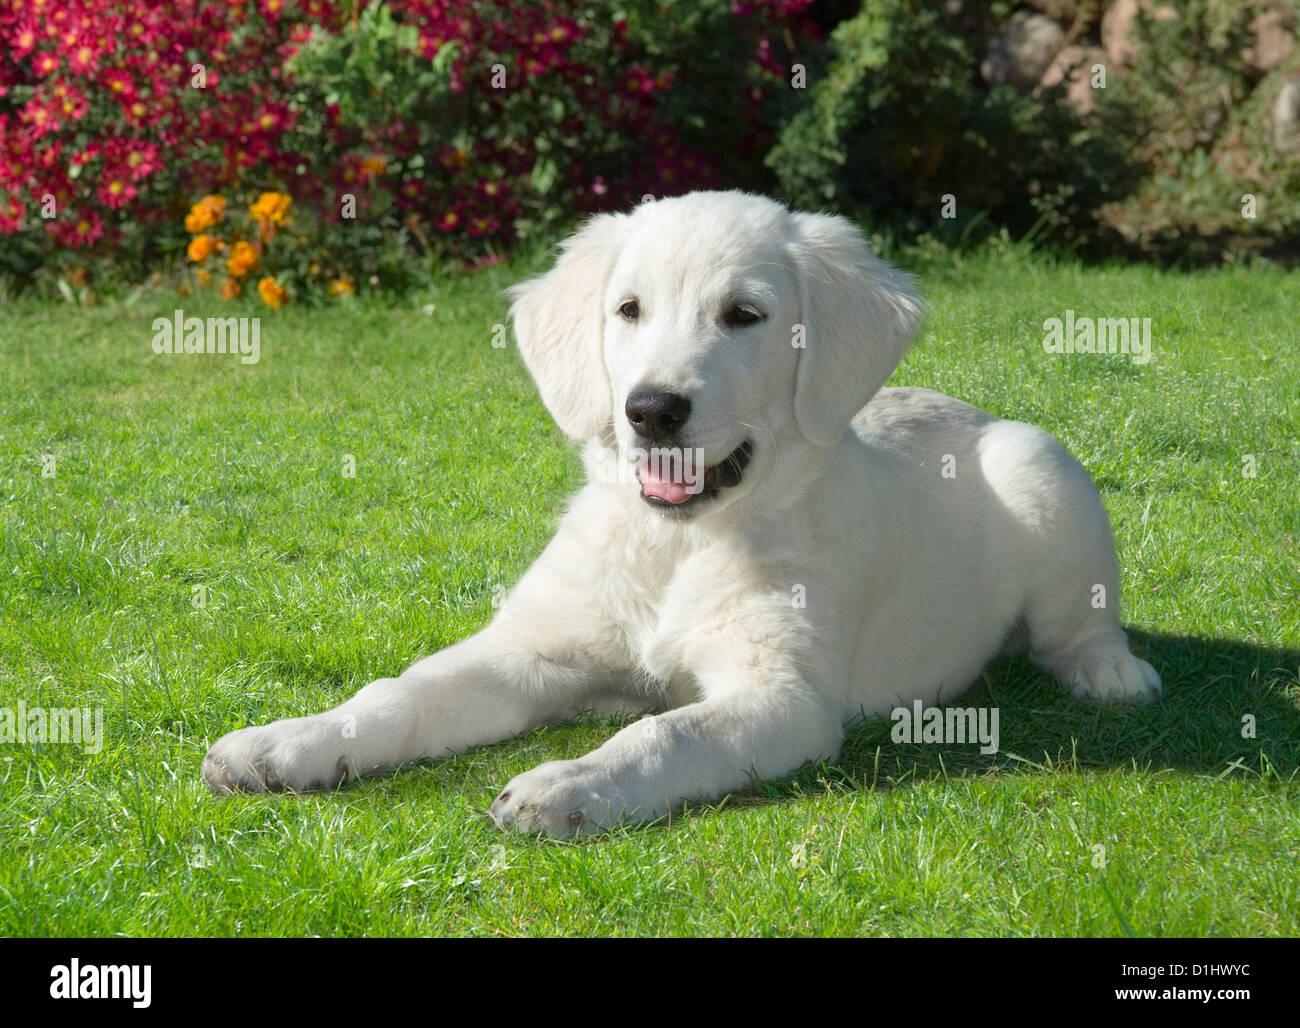 Golden Retriever perro en el jardín Imagen De Stock